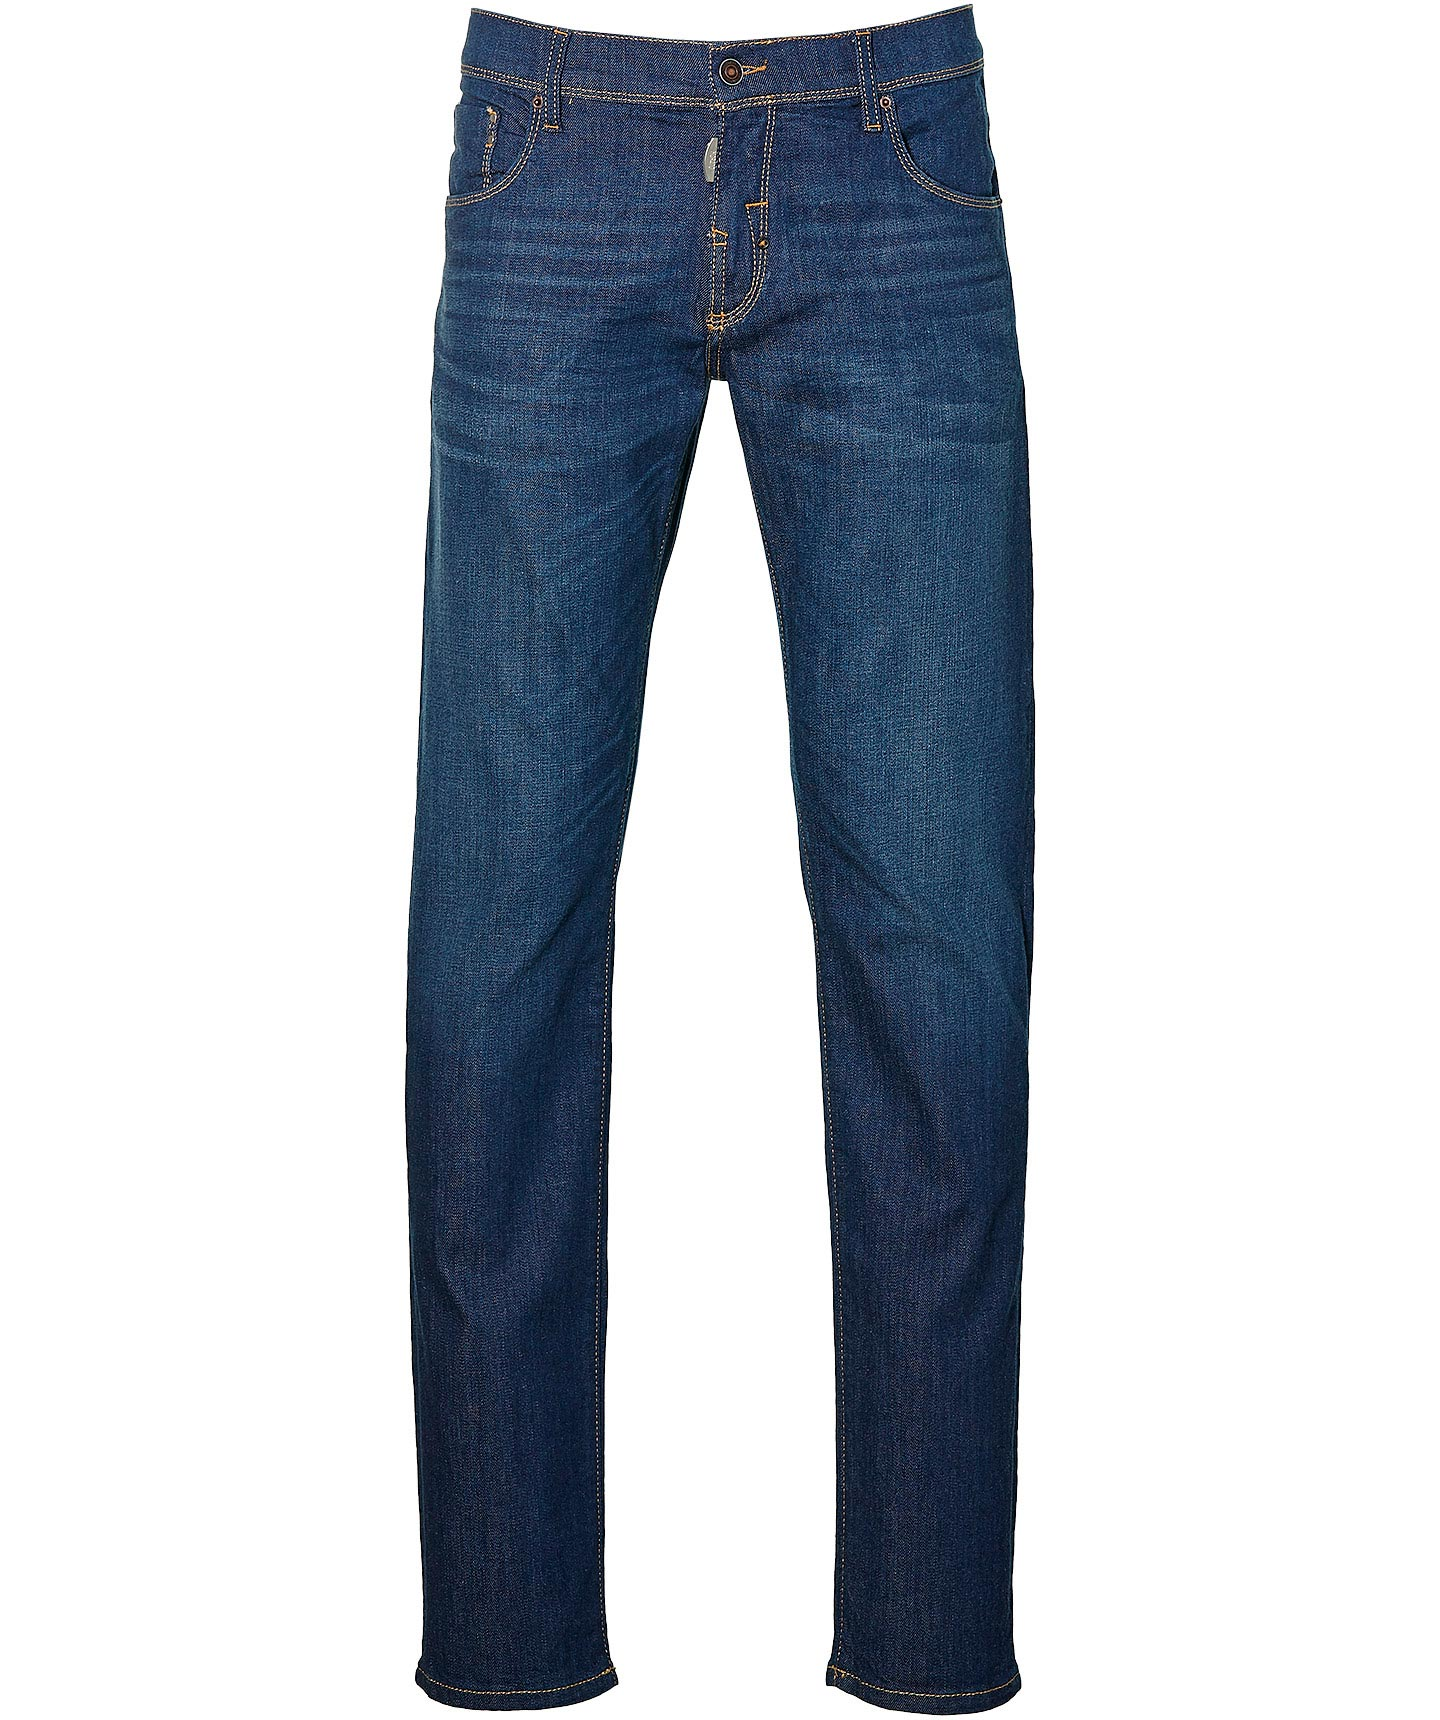 Afbeelding van Antony Morato Jeans Slim Fit Blauw 50